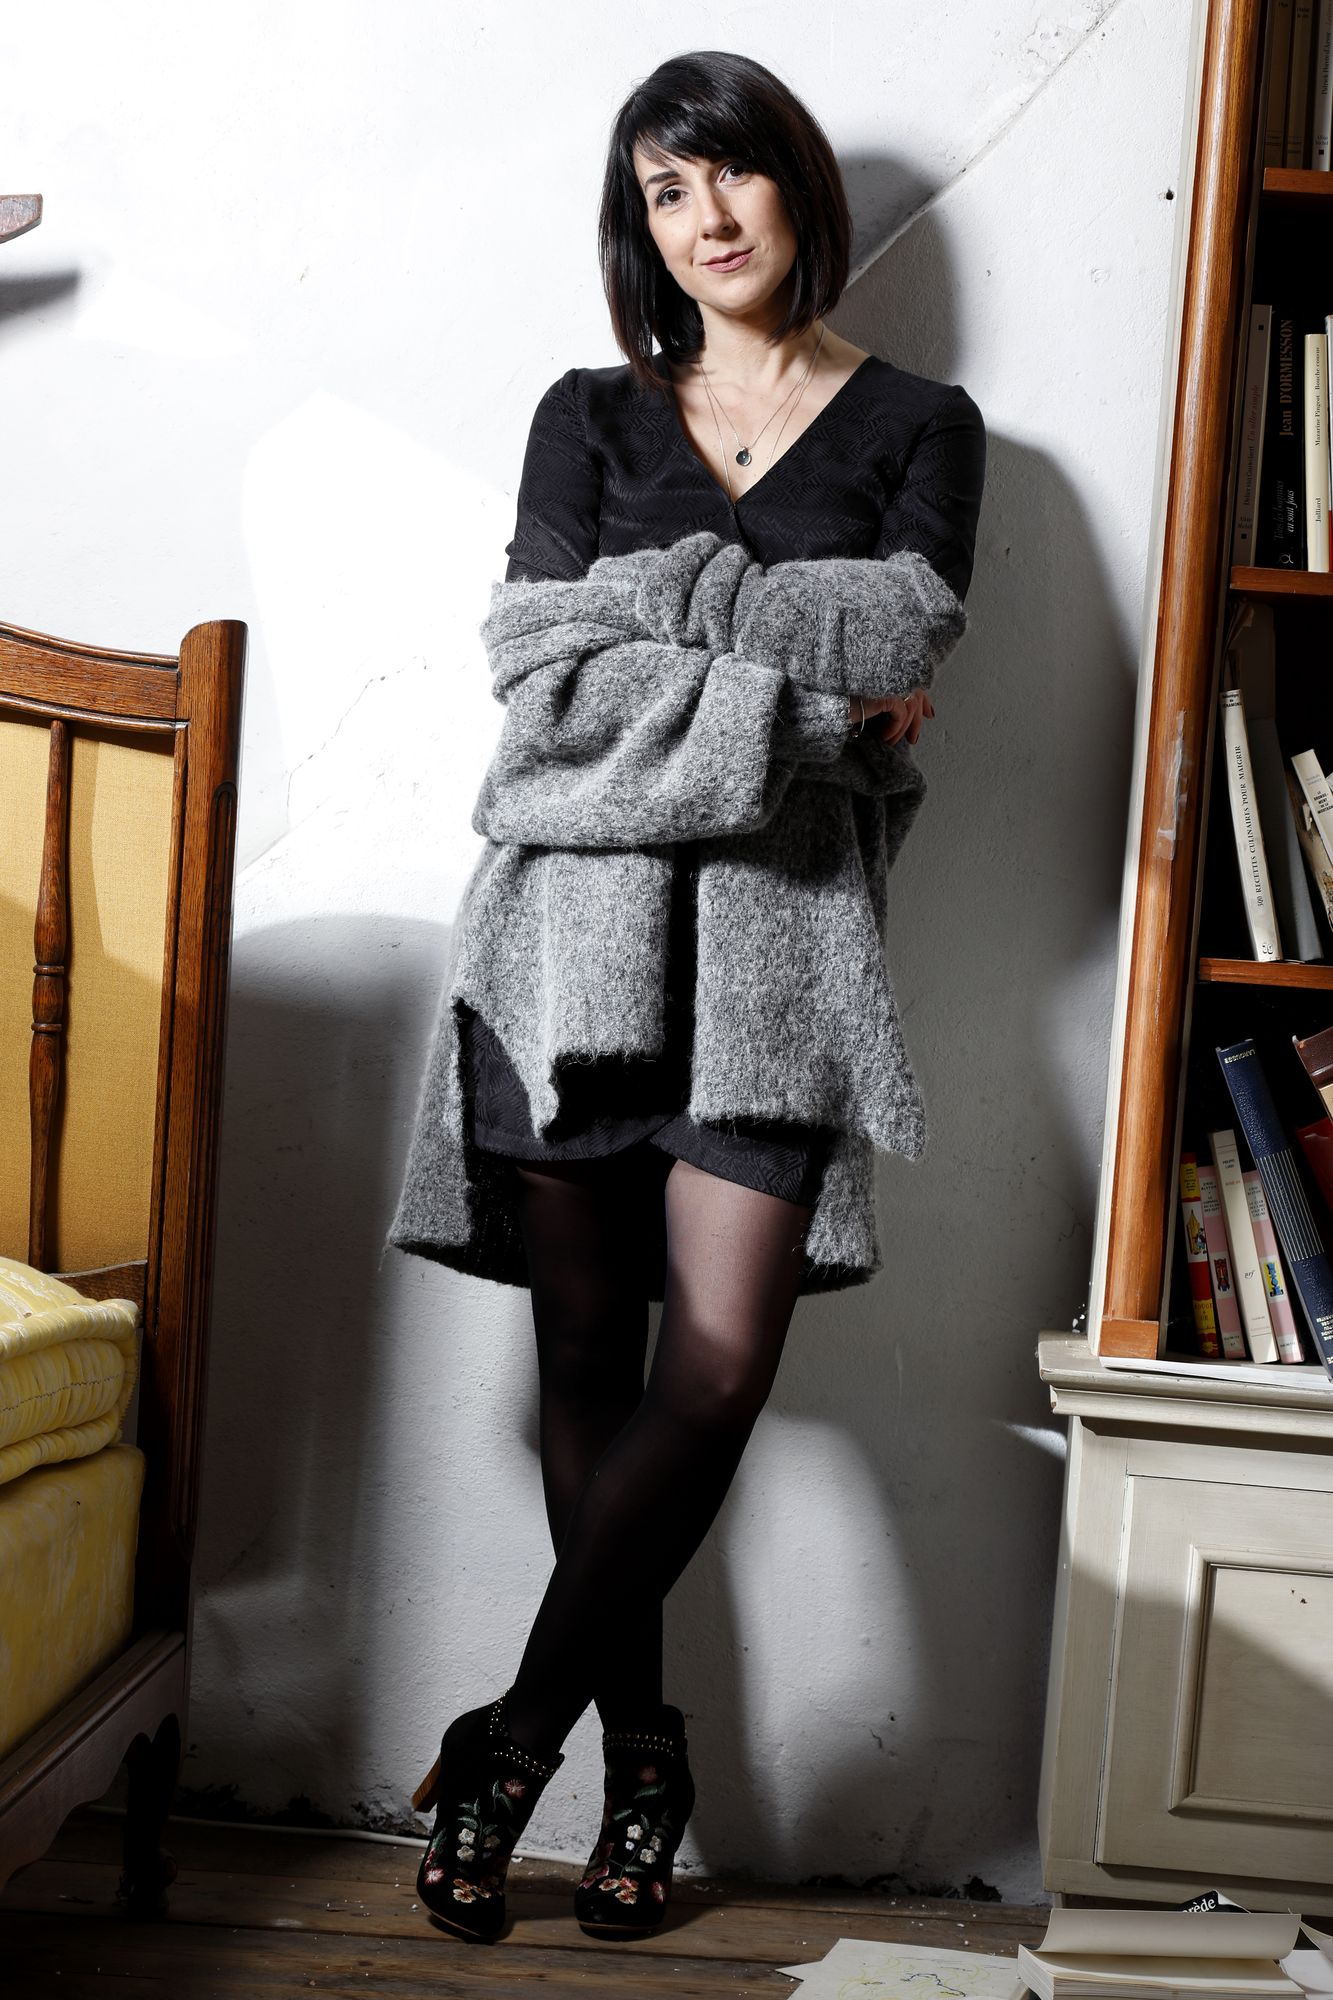 robe en soie et gros gilet